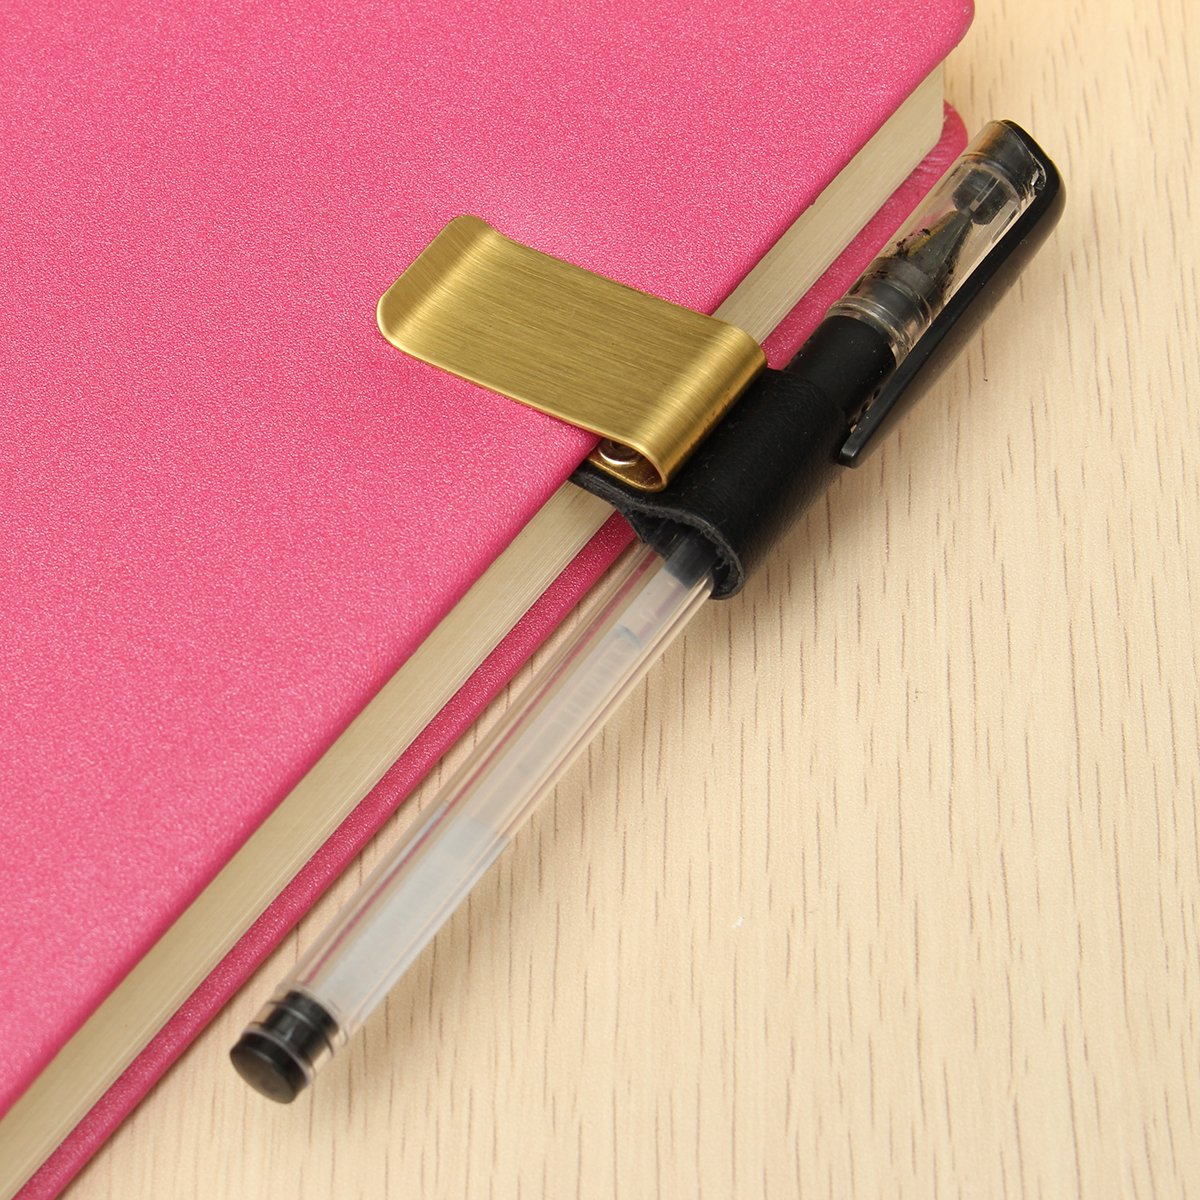 Gold RanDal Stainless Steel Leather Notebook Clip Metal Pen Holder Paper Folder